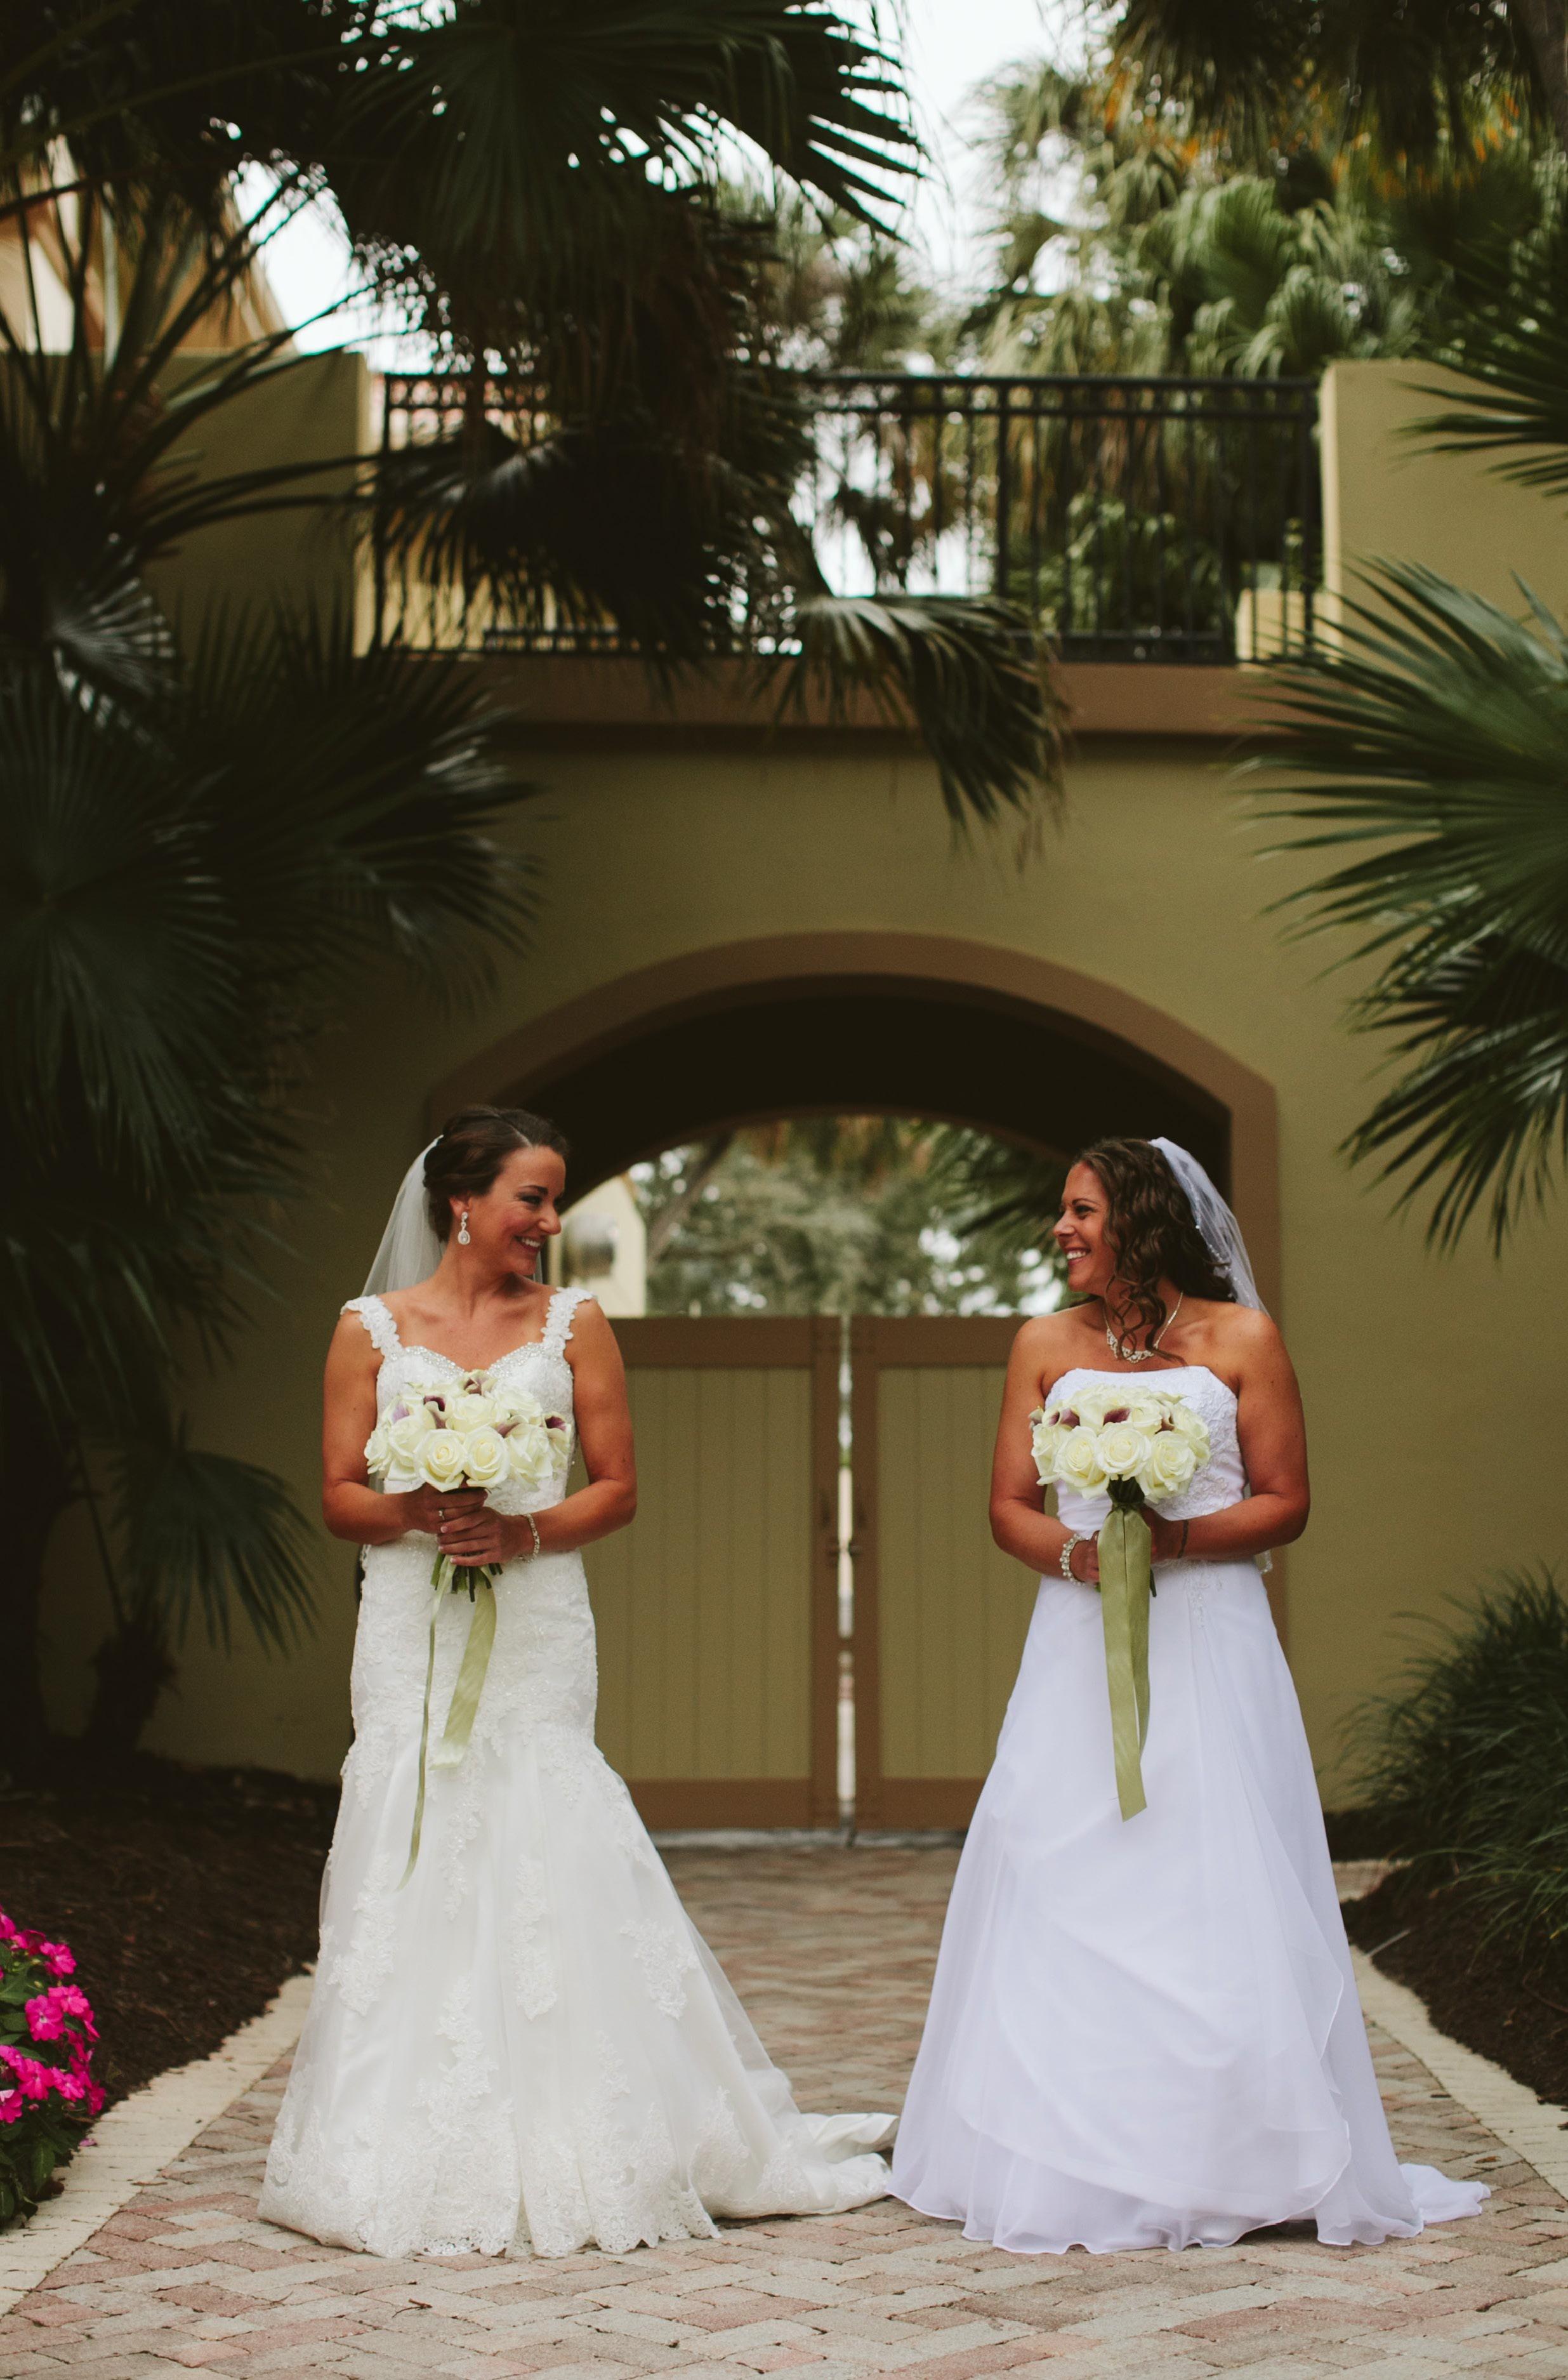 Kim + Monica's Mizner Country Club Wedding in Delray Beach31.jpg